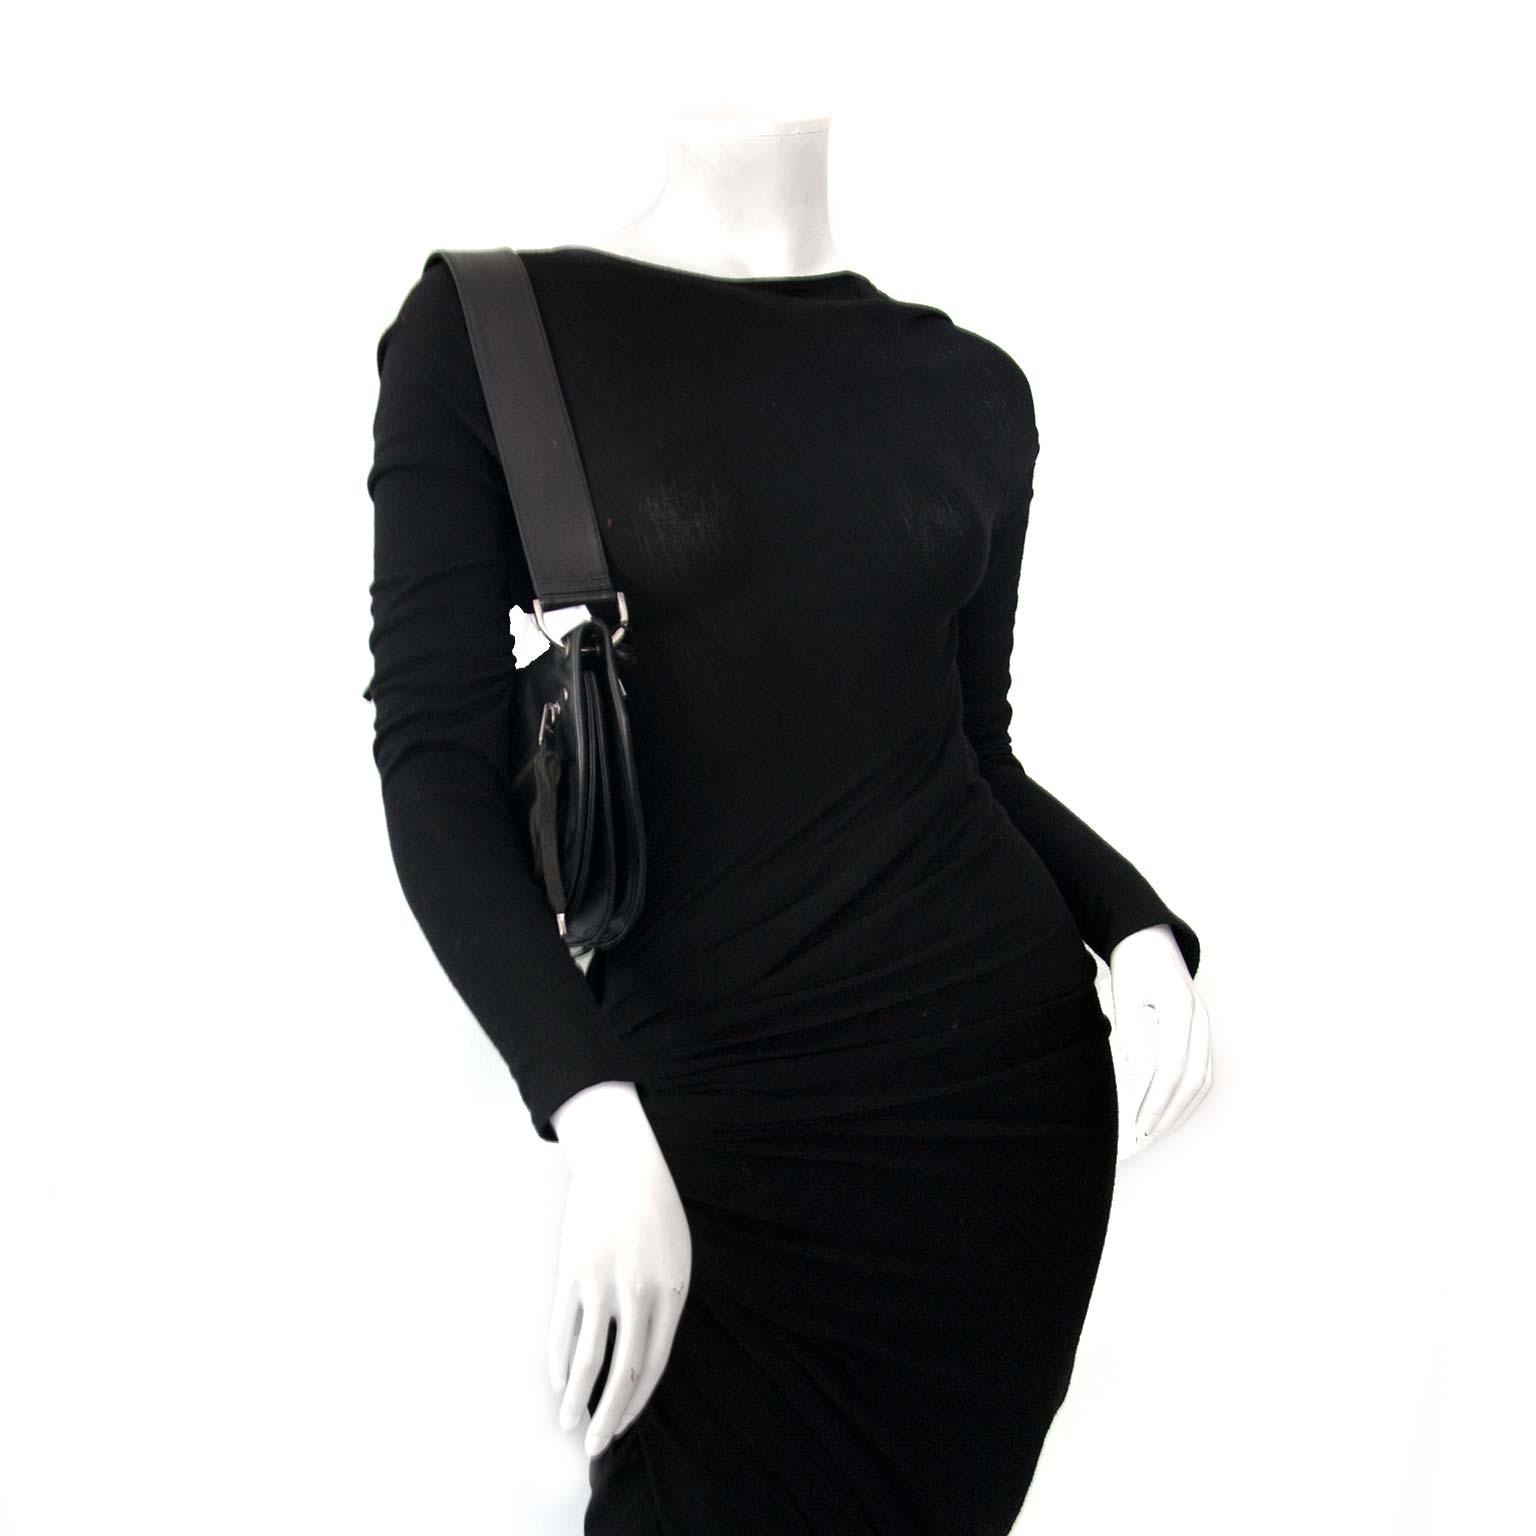 Dior Black Leather Saddle Bag Buy authentic designer Dior secondhand bags at Labellov at the best price. Safe and secure shopping. Koop tweedehands authentieke Dior tassen bij designer webwinkel labellov.